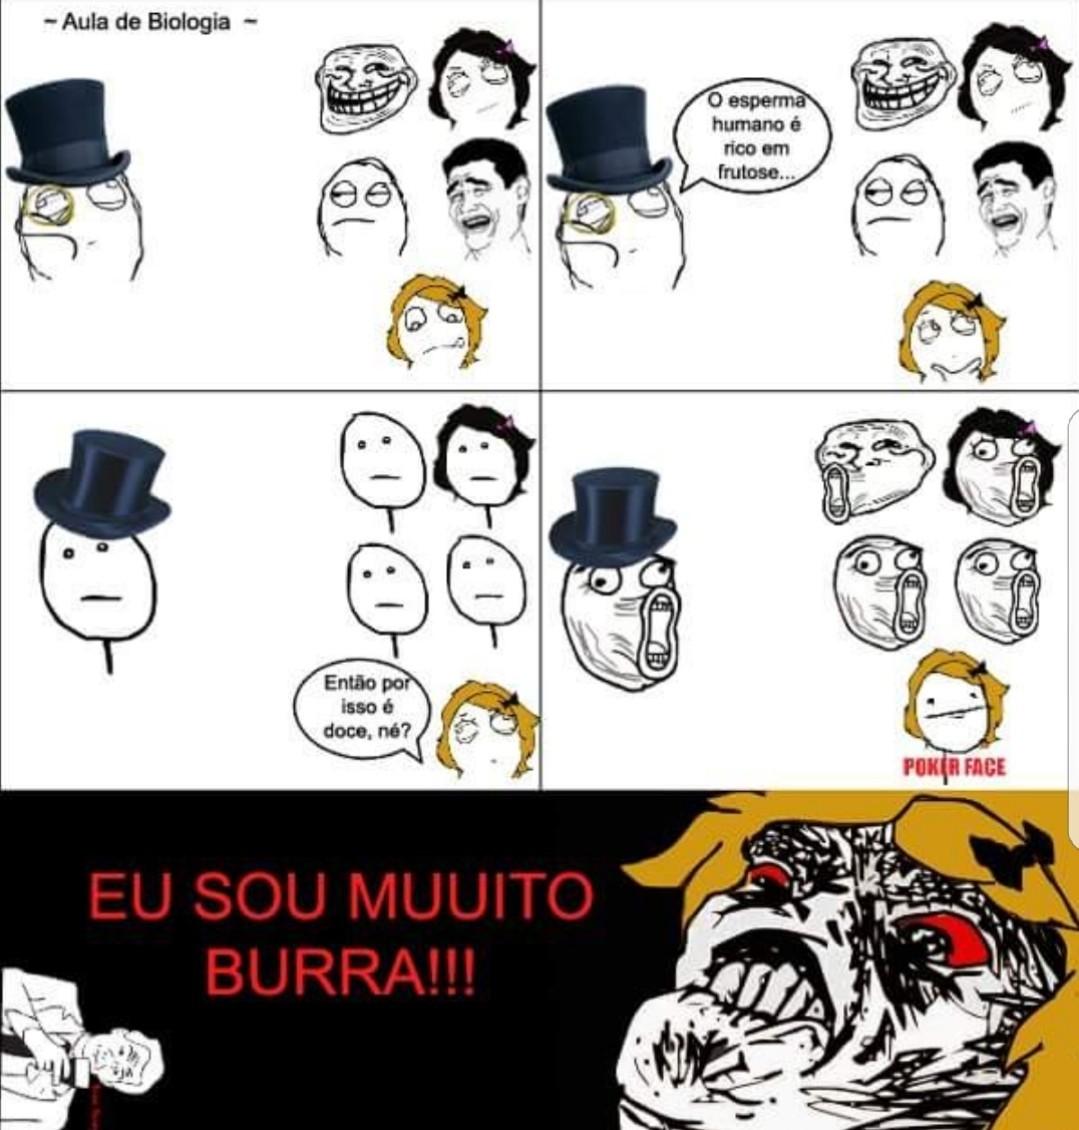 Burra - meme